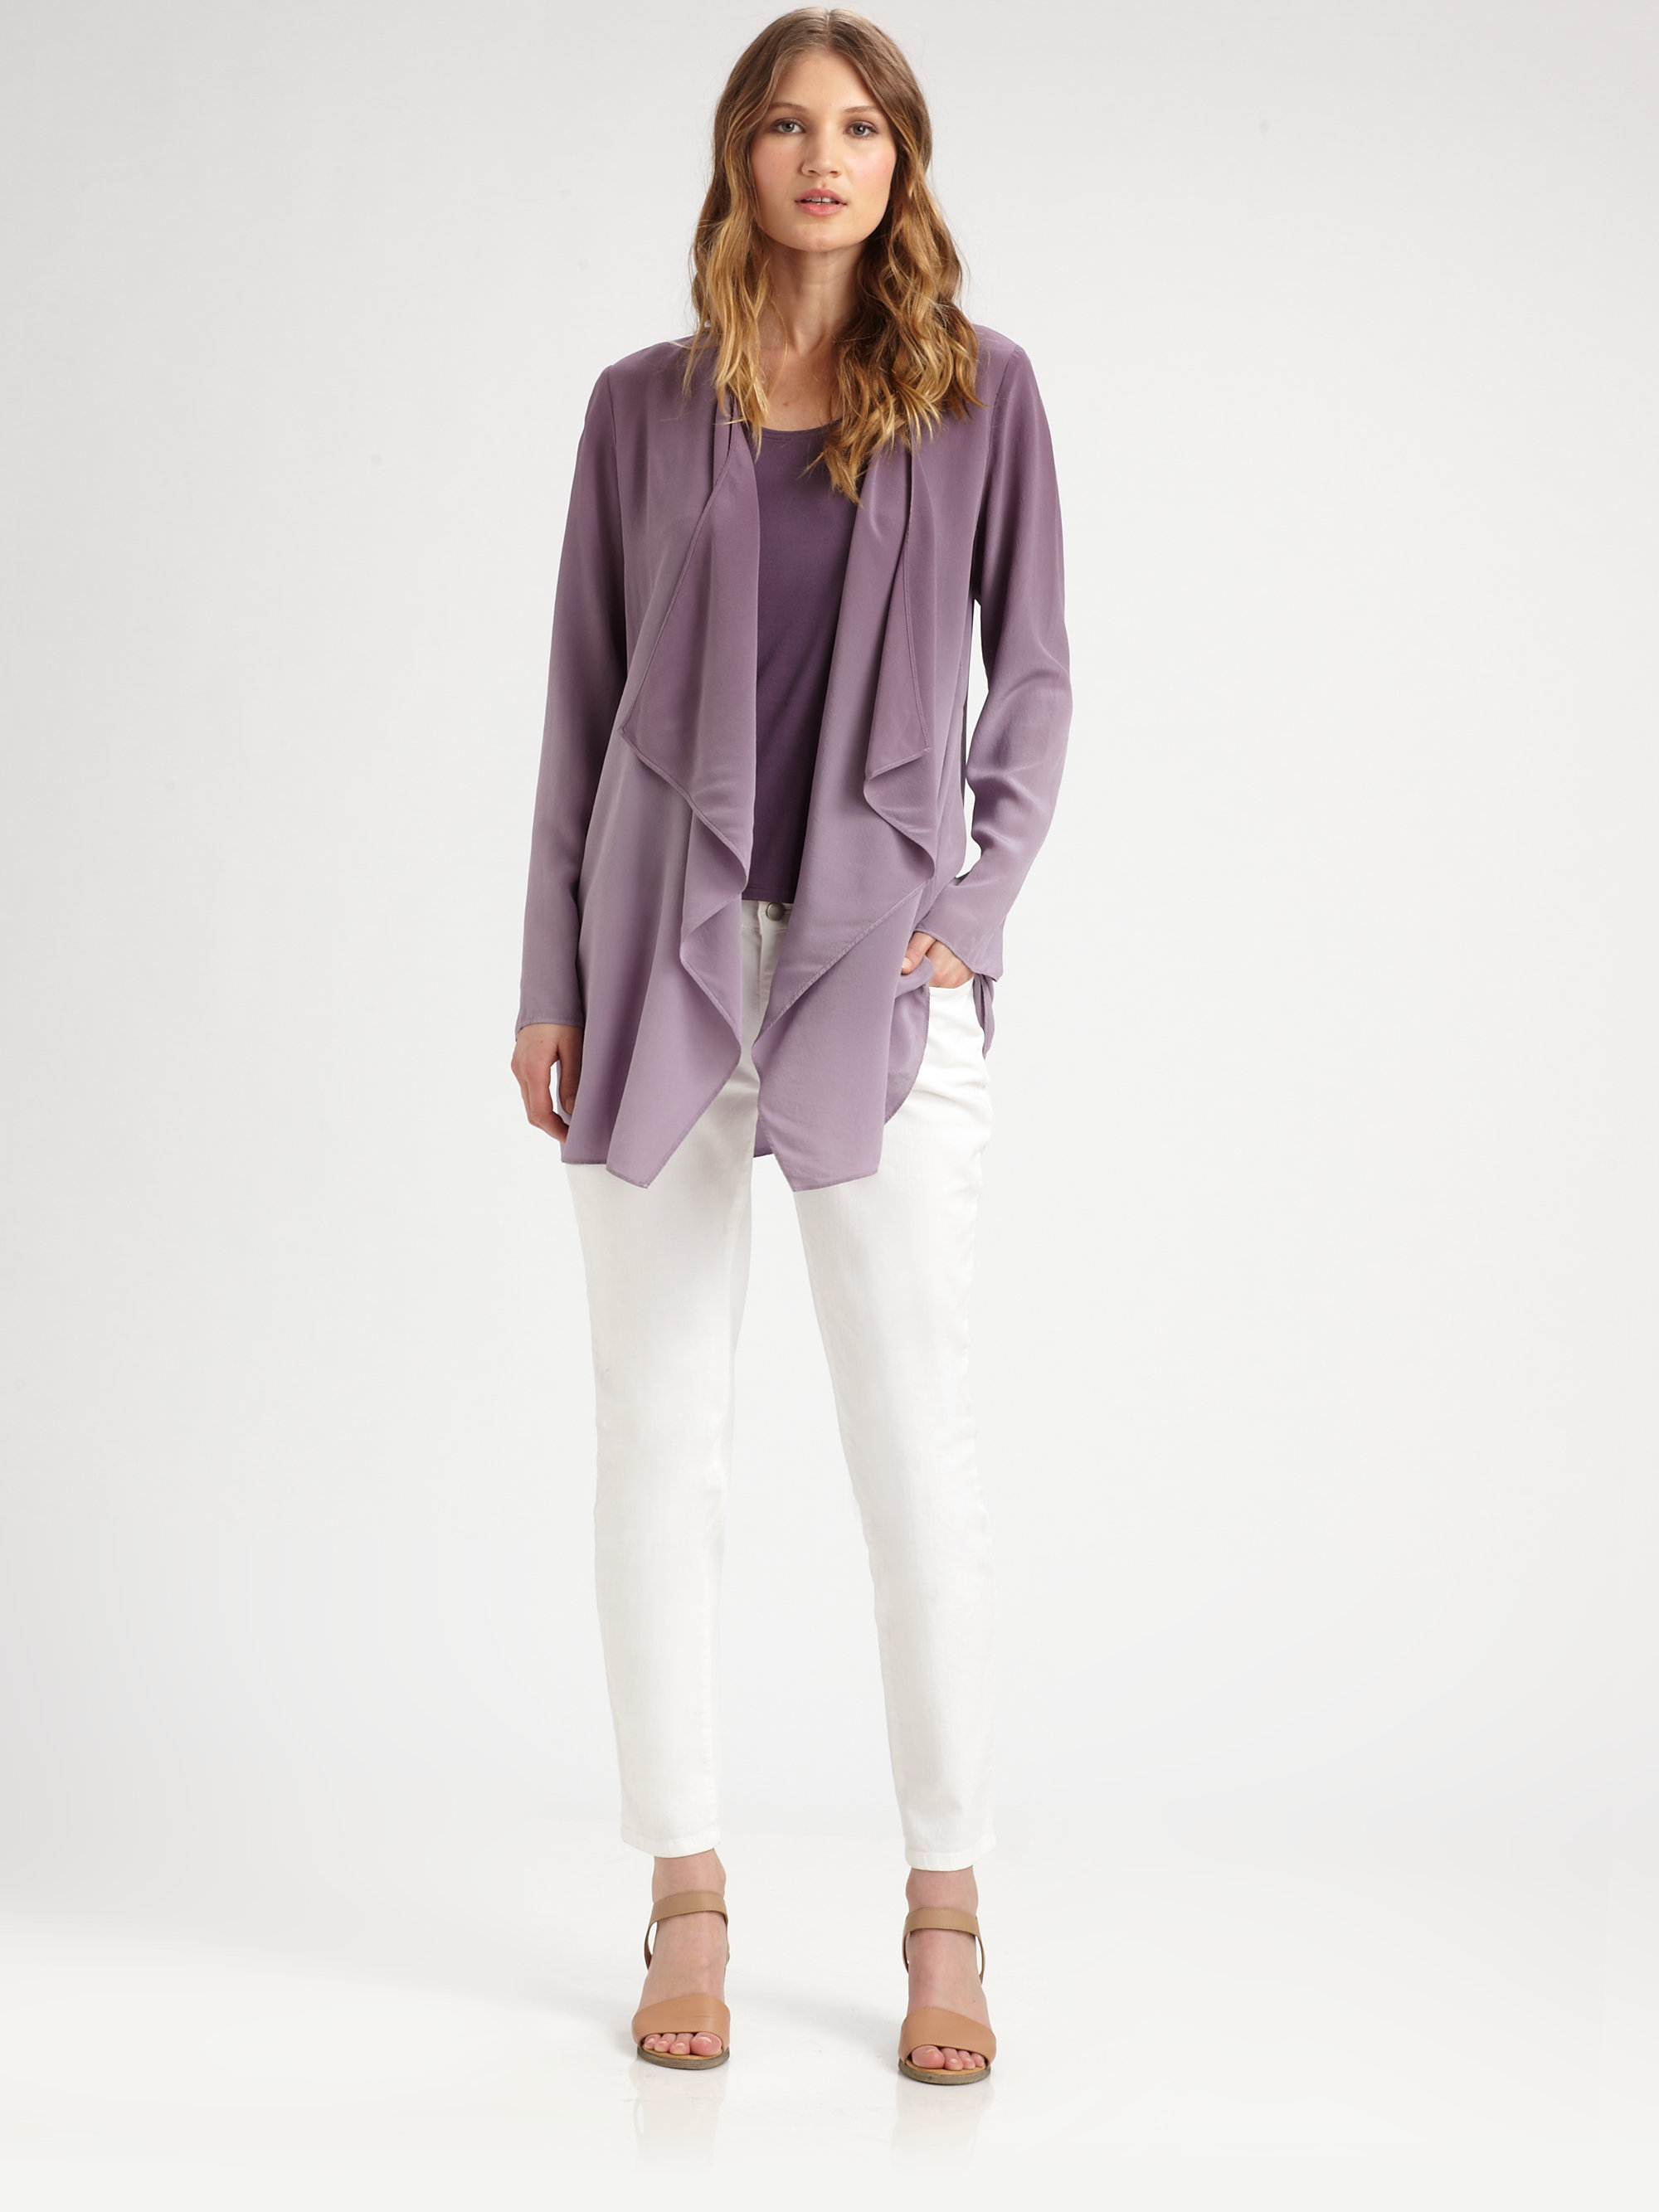 Lyst Eileen Fisher Silk Ombre Jacket